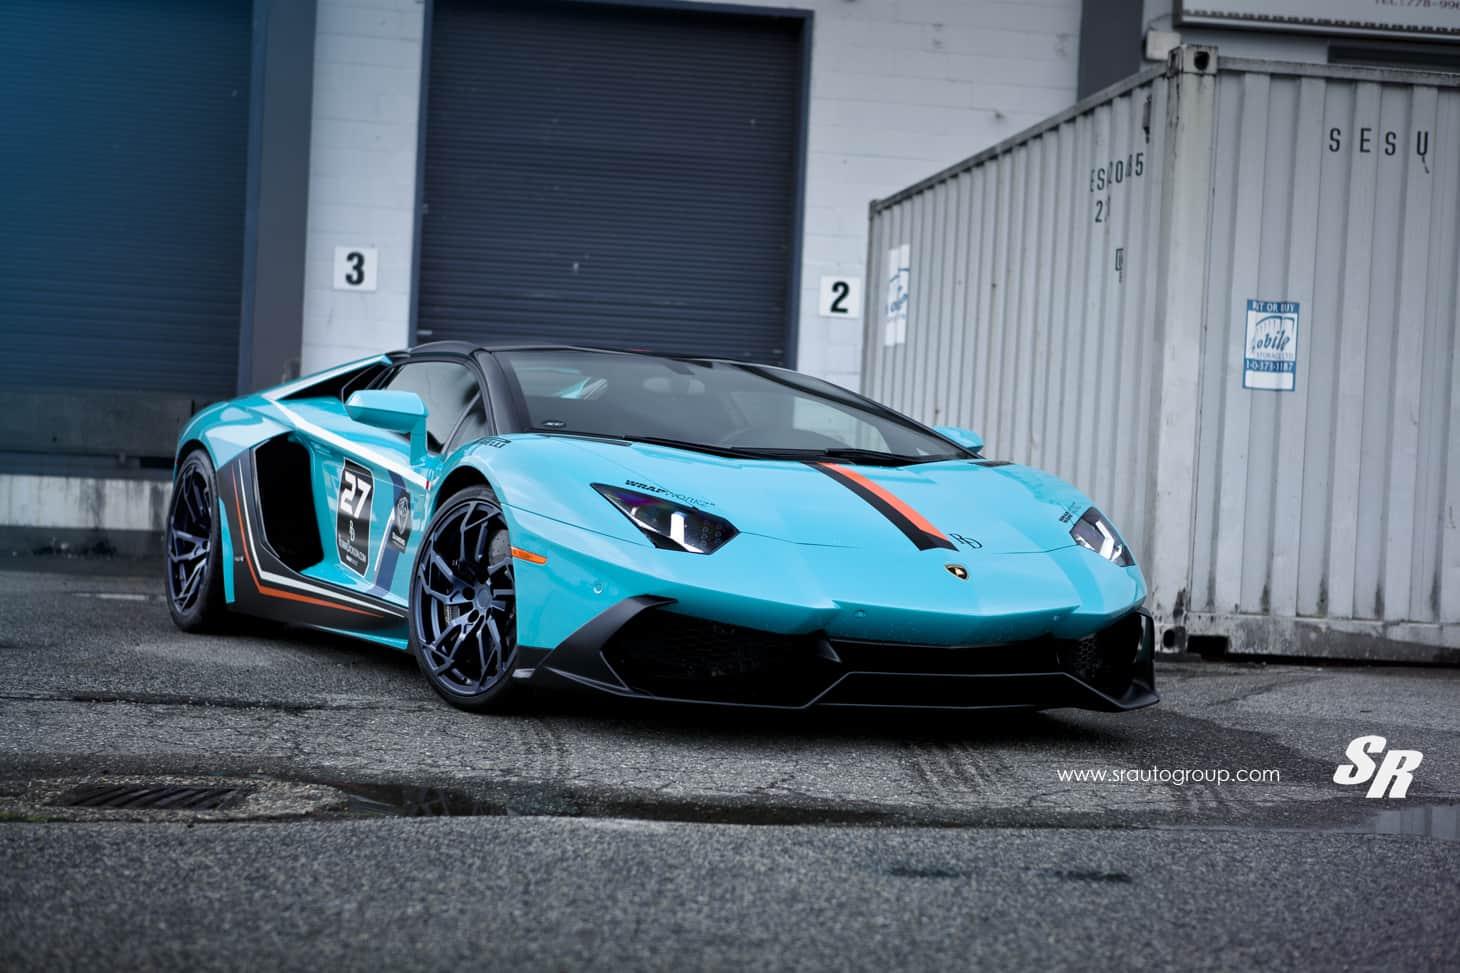 This Awesome Lamborghini Aventador Is Beyond Futuristic